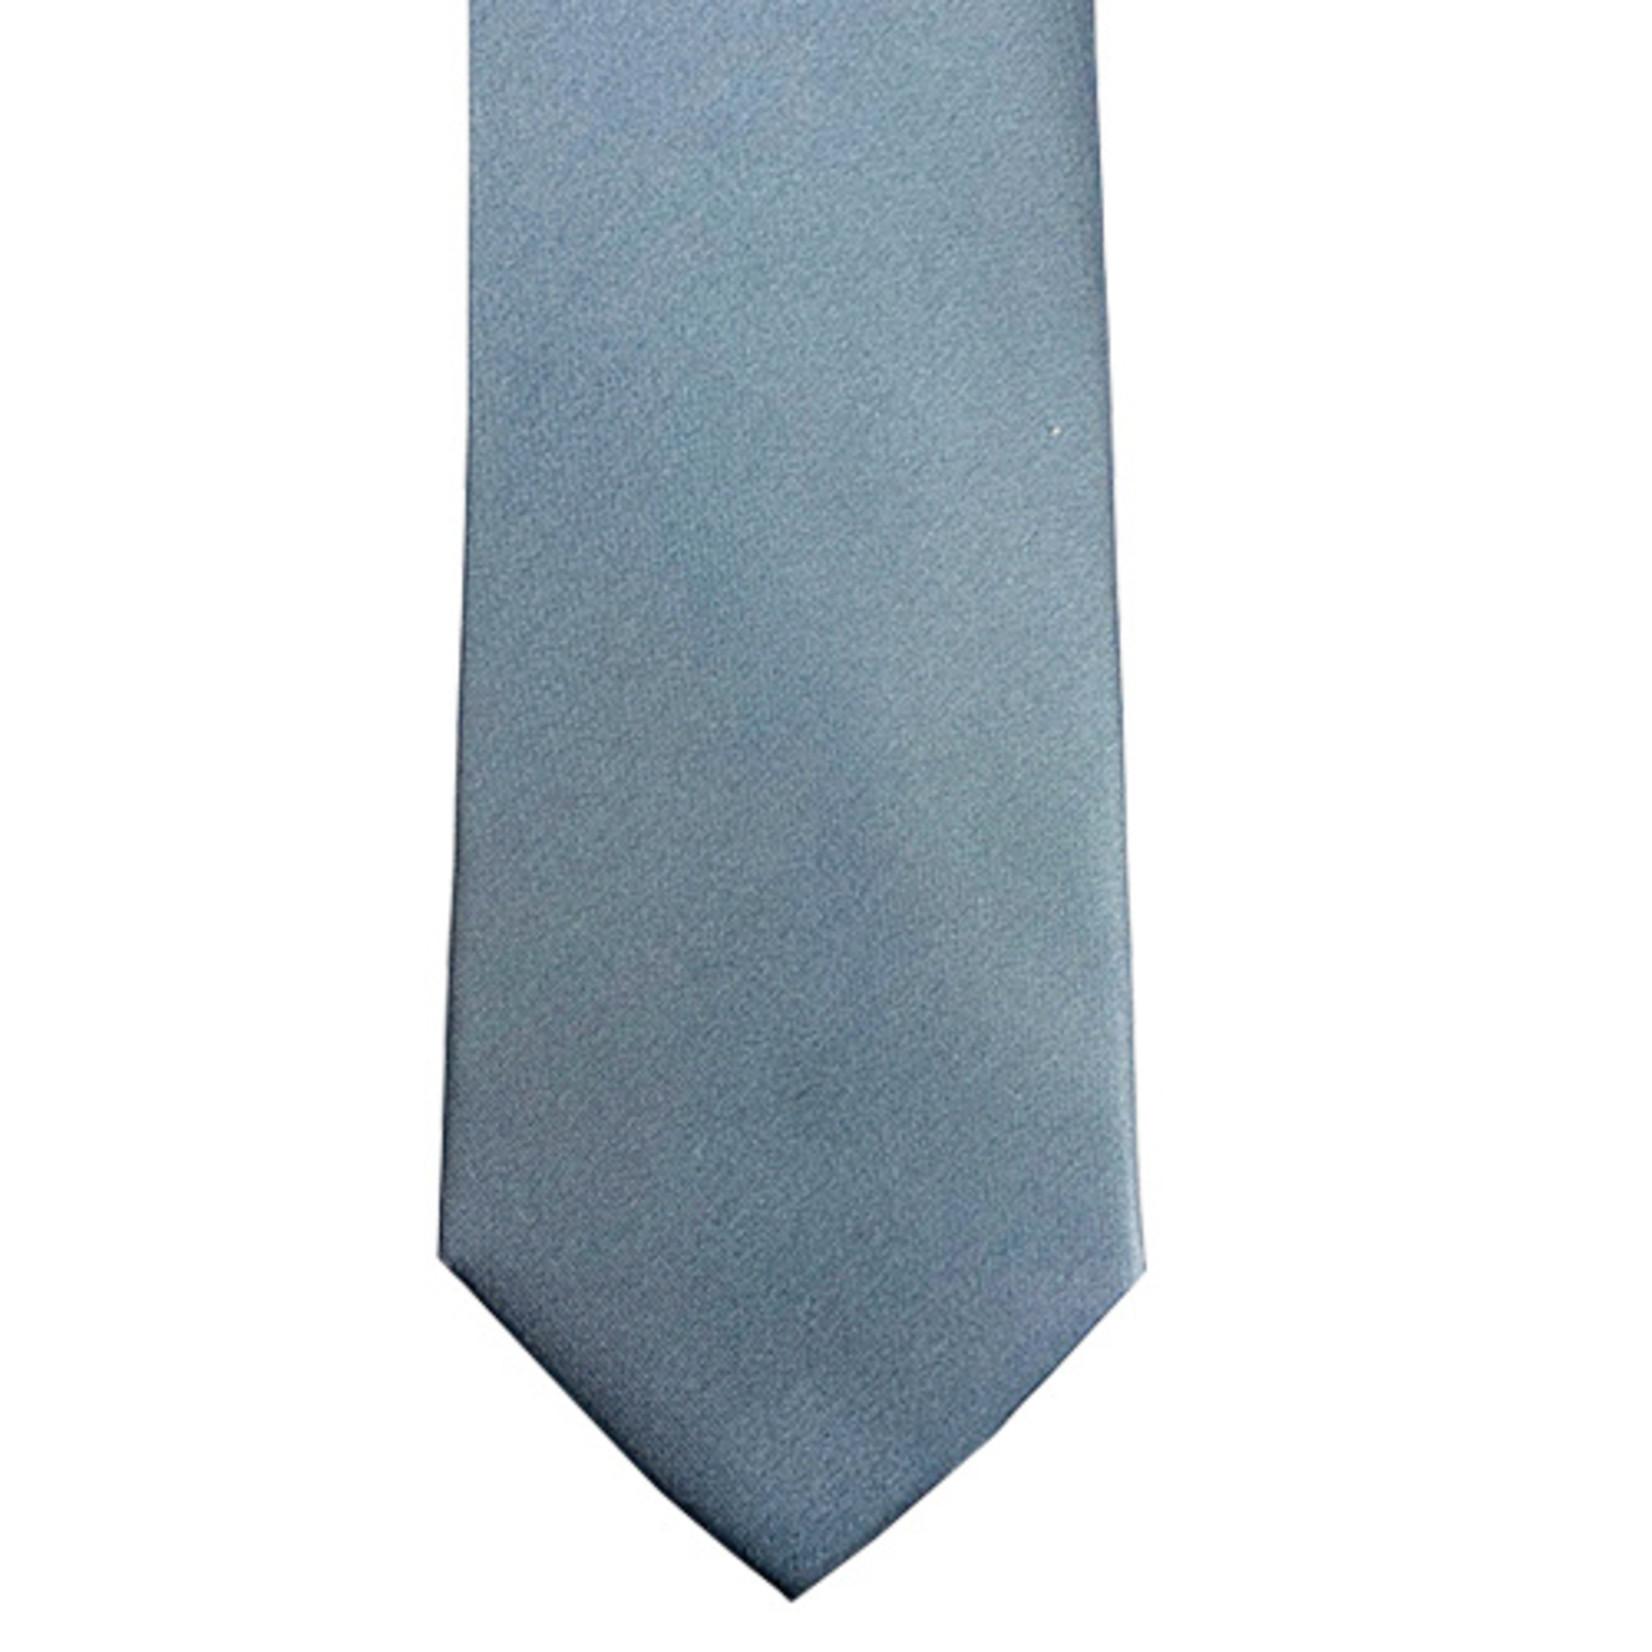 Knotz M100-46 Solid Gray Tie